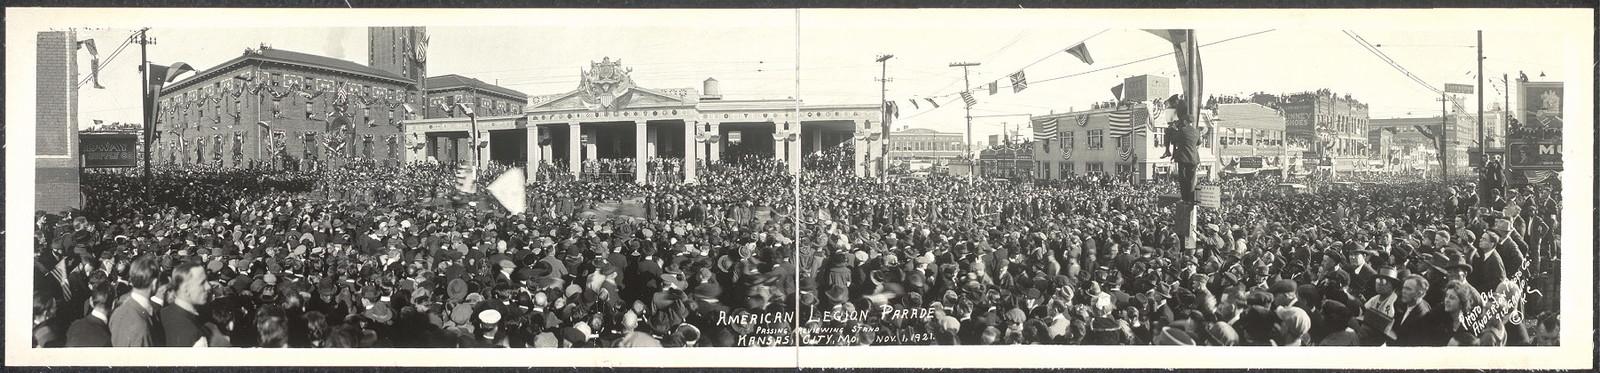 American Legion Parade passing reviewing stand, Kansas City, Mo., Nov. 1, 1921